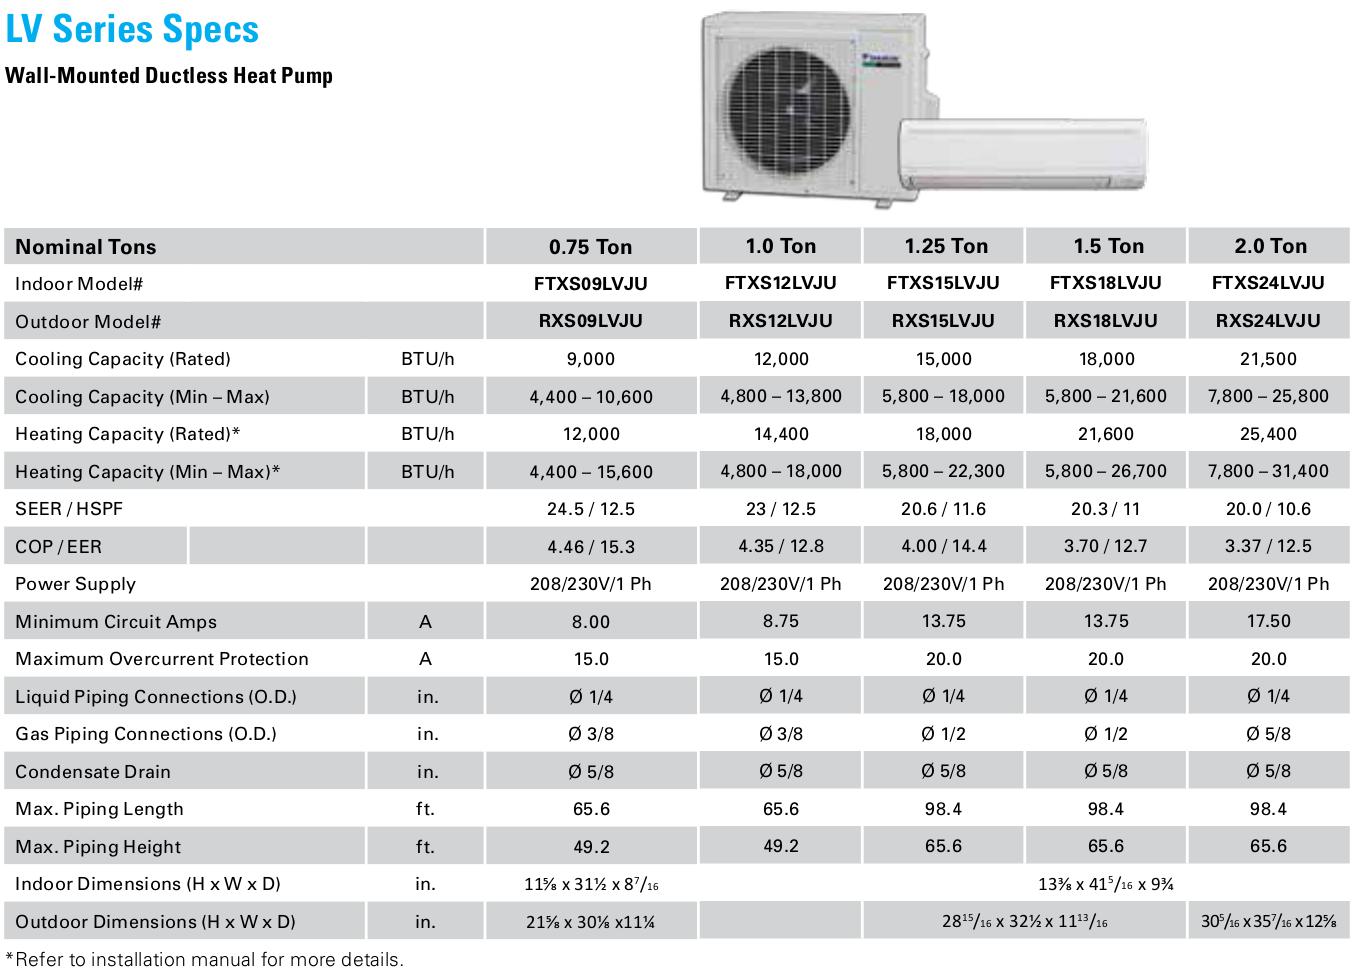 Senville Mini Split Wiring Electrical Diagram Lg Heat Pump Auto Parts Air Conditioner